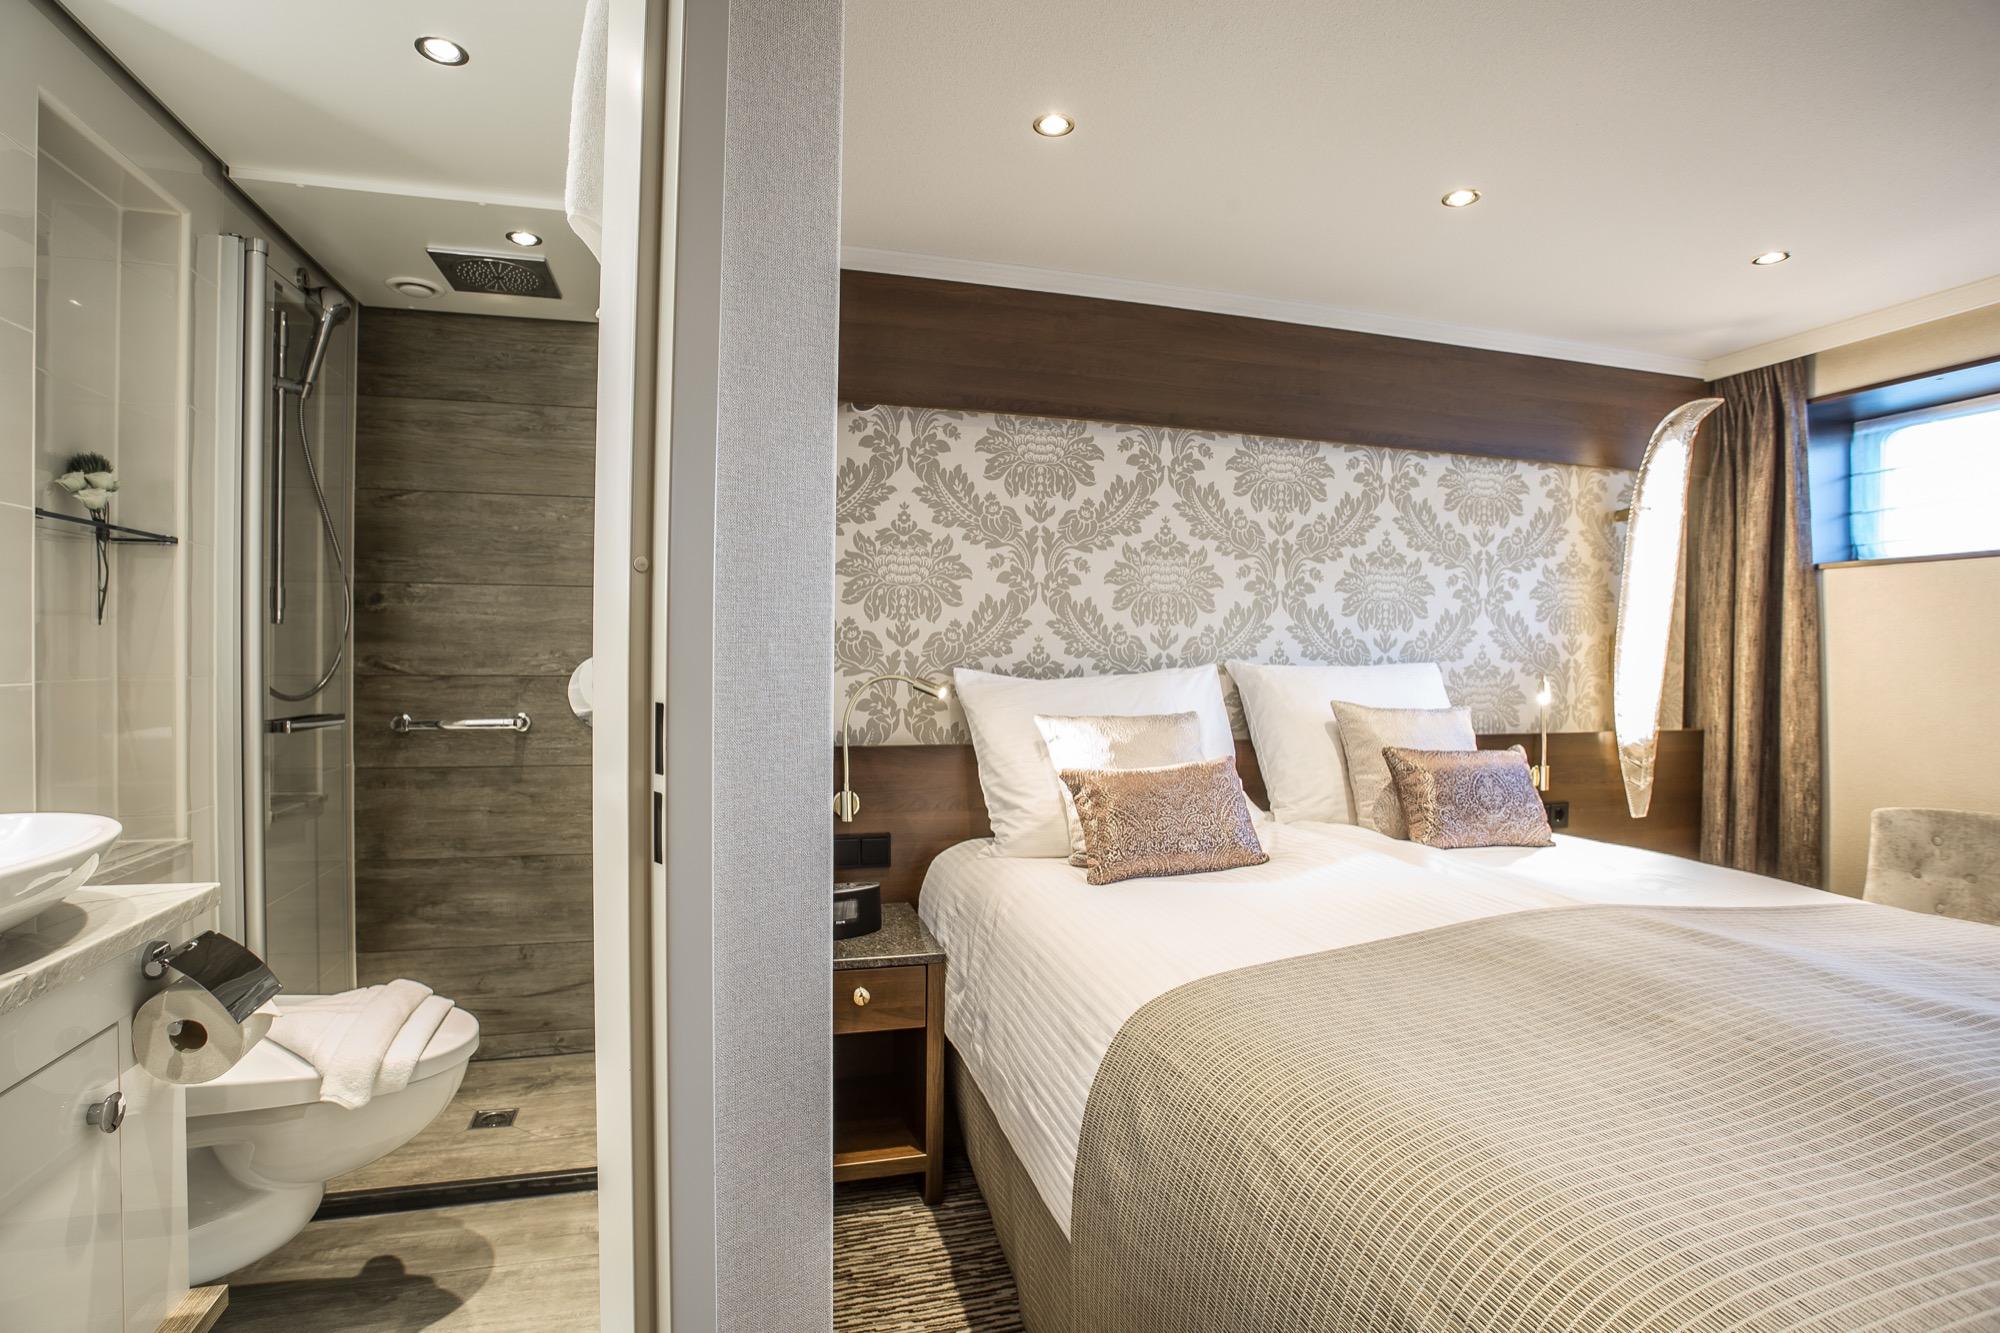 Riviera Travel Thomas Hardy Accommodation Lower Deck Suite 1.jpg